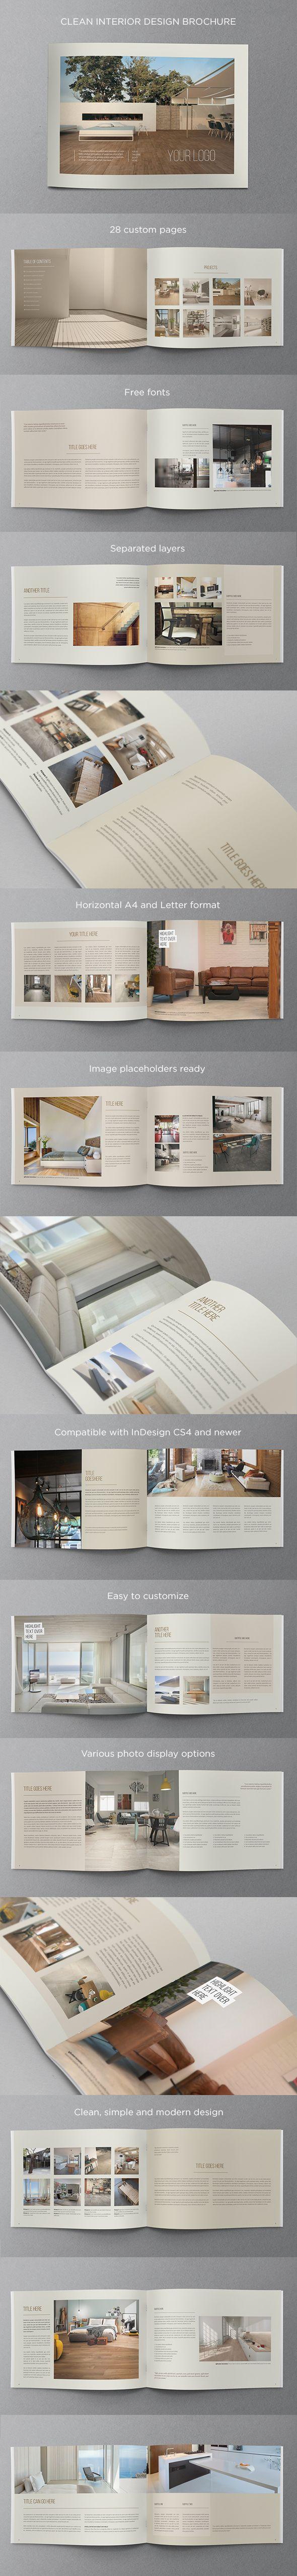 Clean Interior Design Brochure. Download here: http://graphicriver.net/item/clean-interior-design-brochure/11531896?ref=abradesign #design #brochure